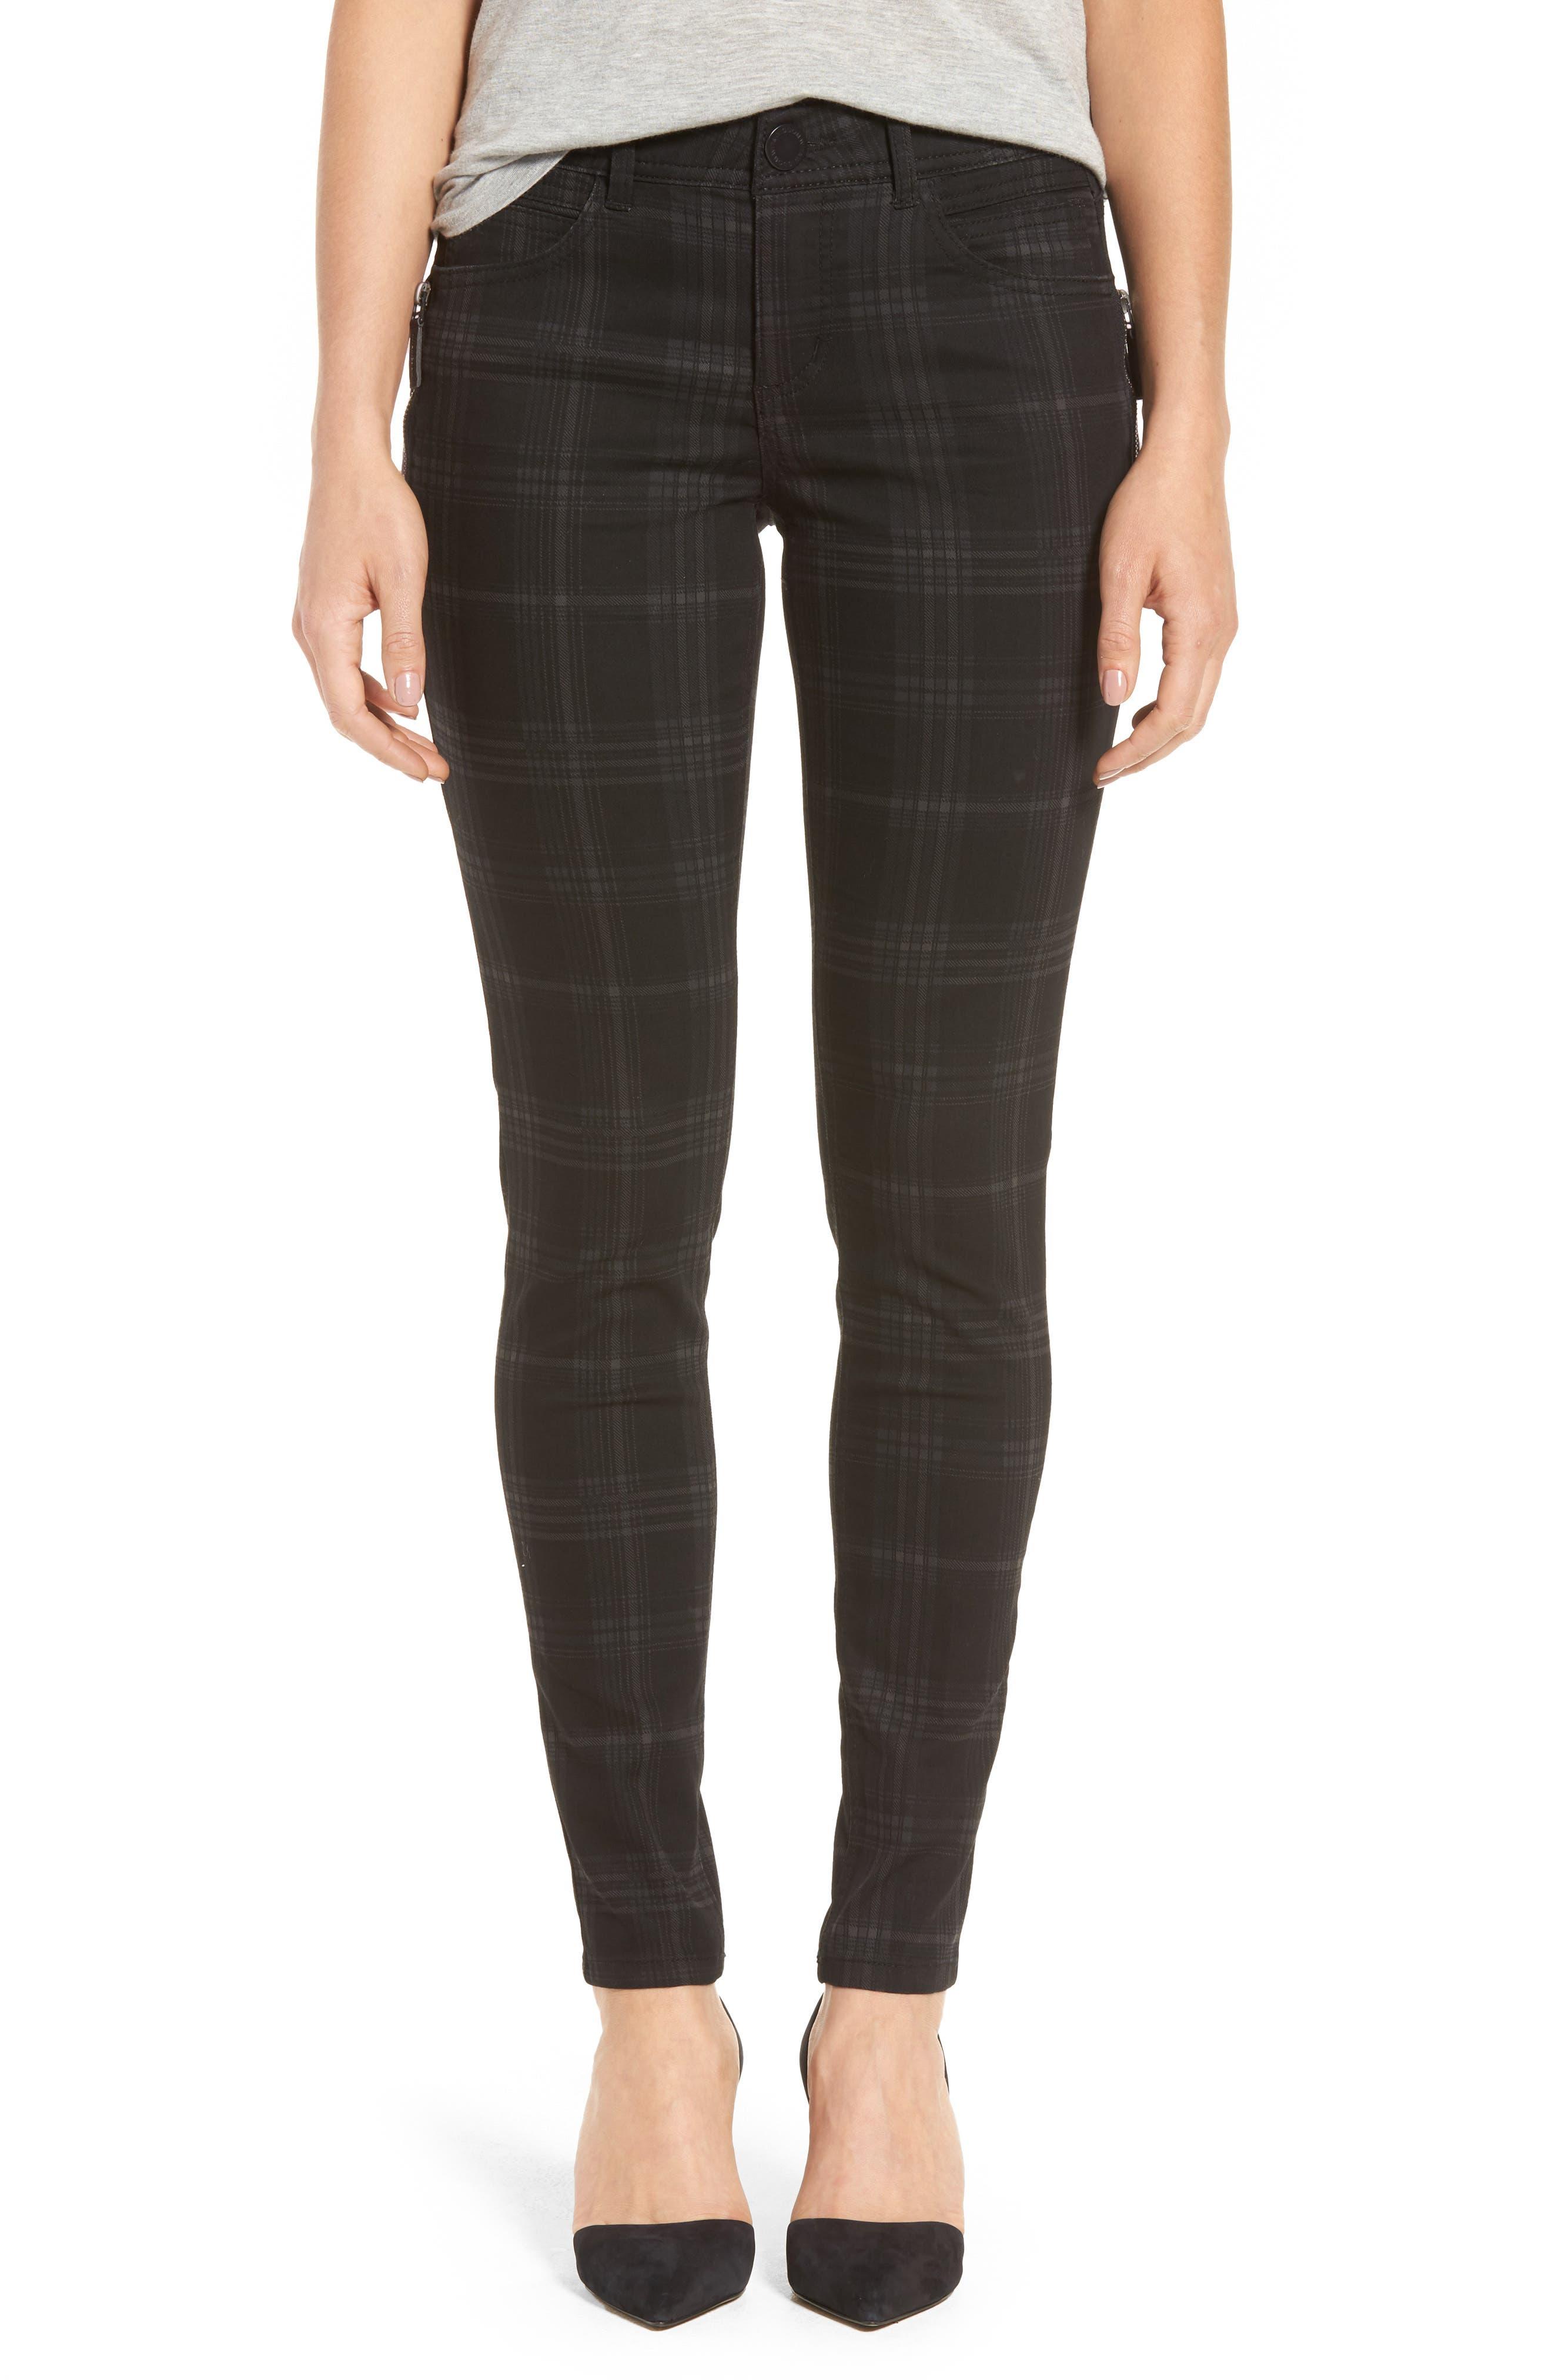 WIT & WISDOM, Ab-solution Side Zip Plaid Skinny Pants, Main thumbnail 1, color, BLACK